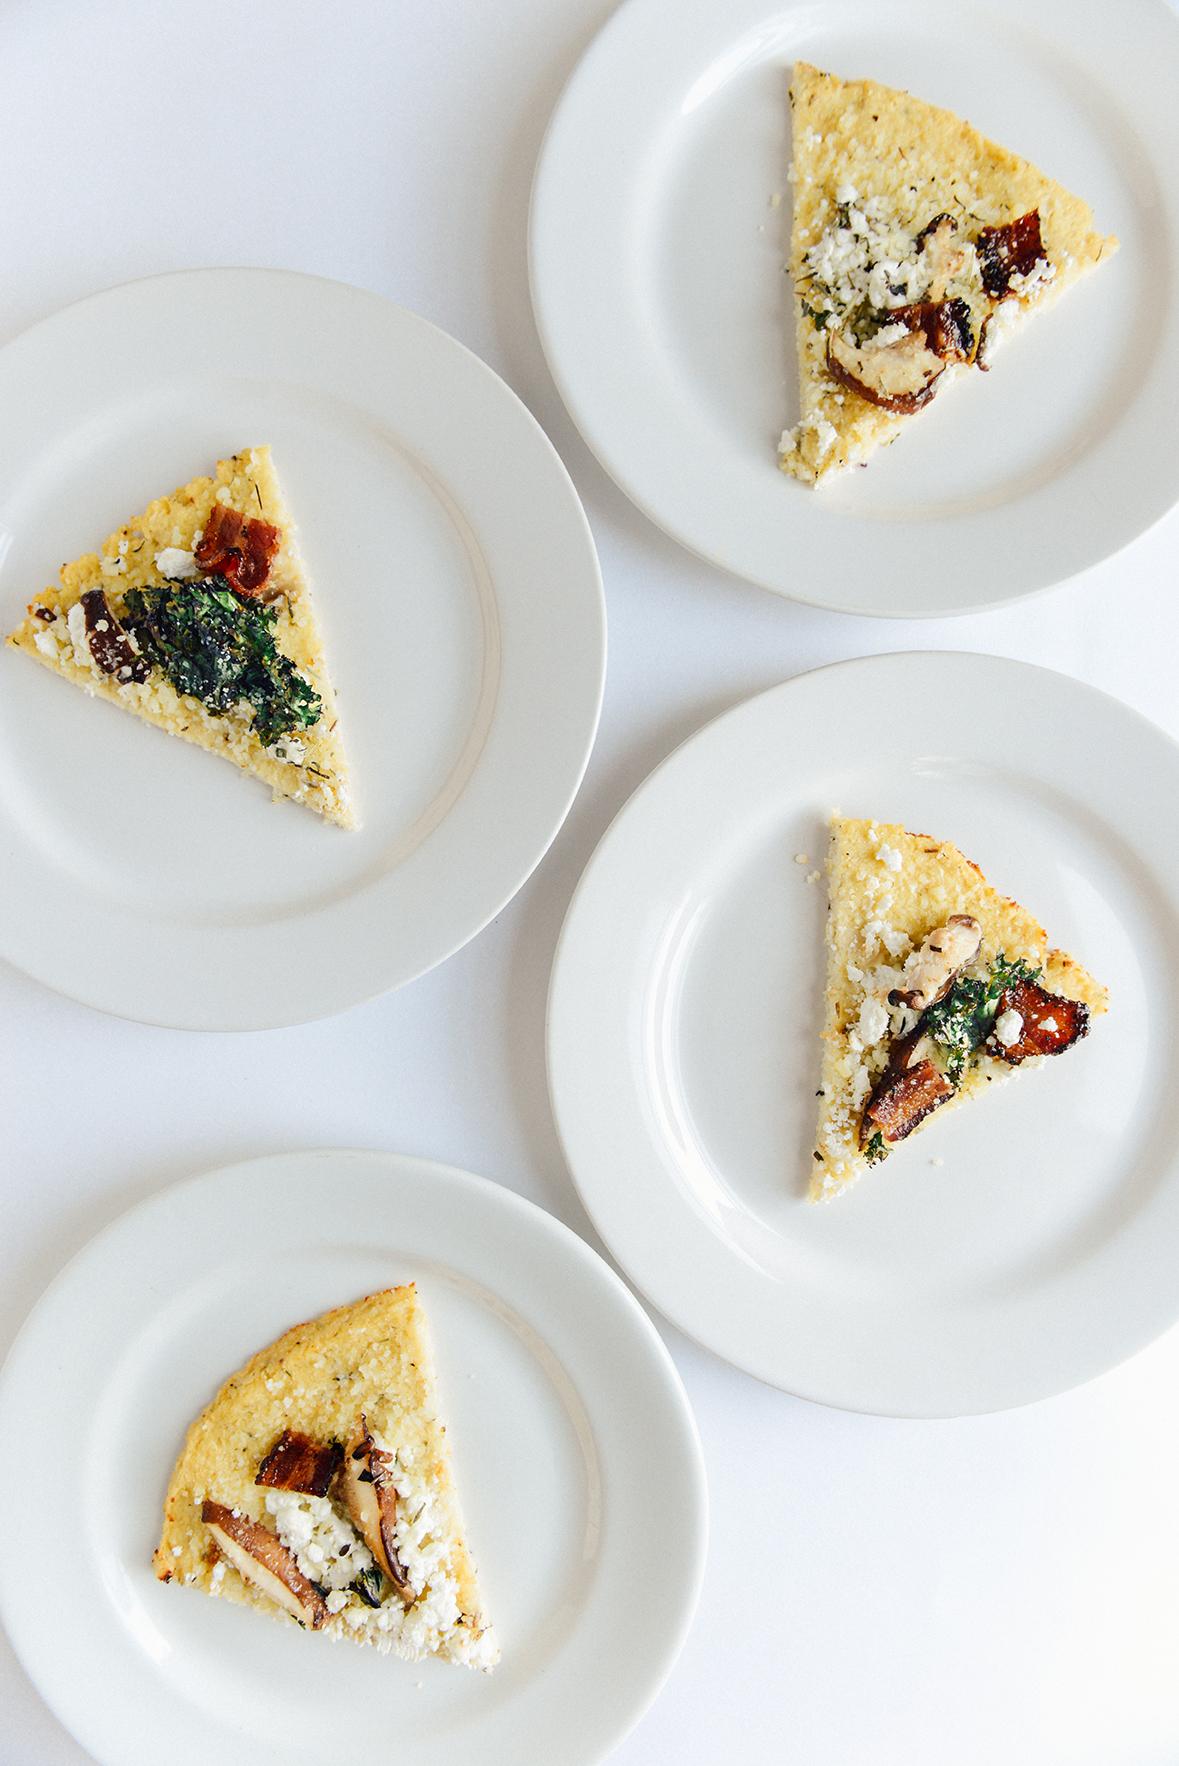 Cauliflower Crust Pizza with Bacon, Mushrooms & Kale (Gluten Free)